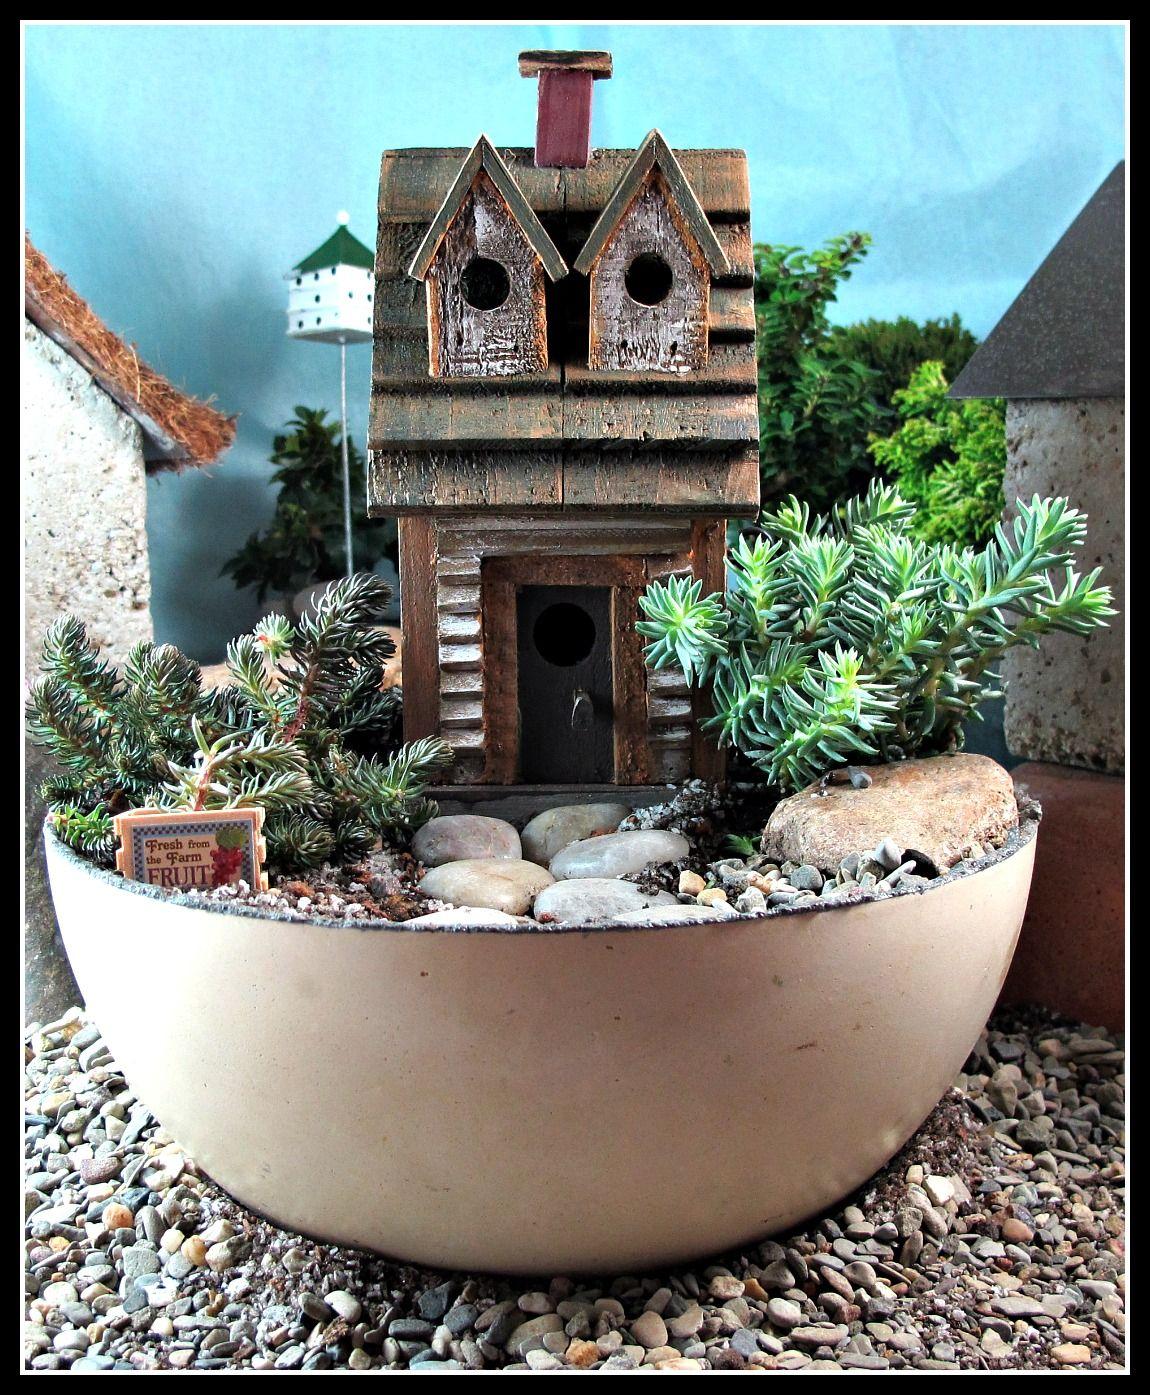 Gnome In Garden: Woodland Fairy House Miniature Garden